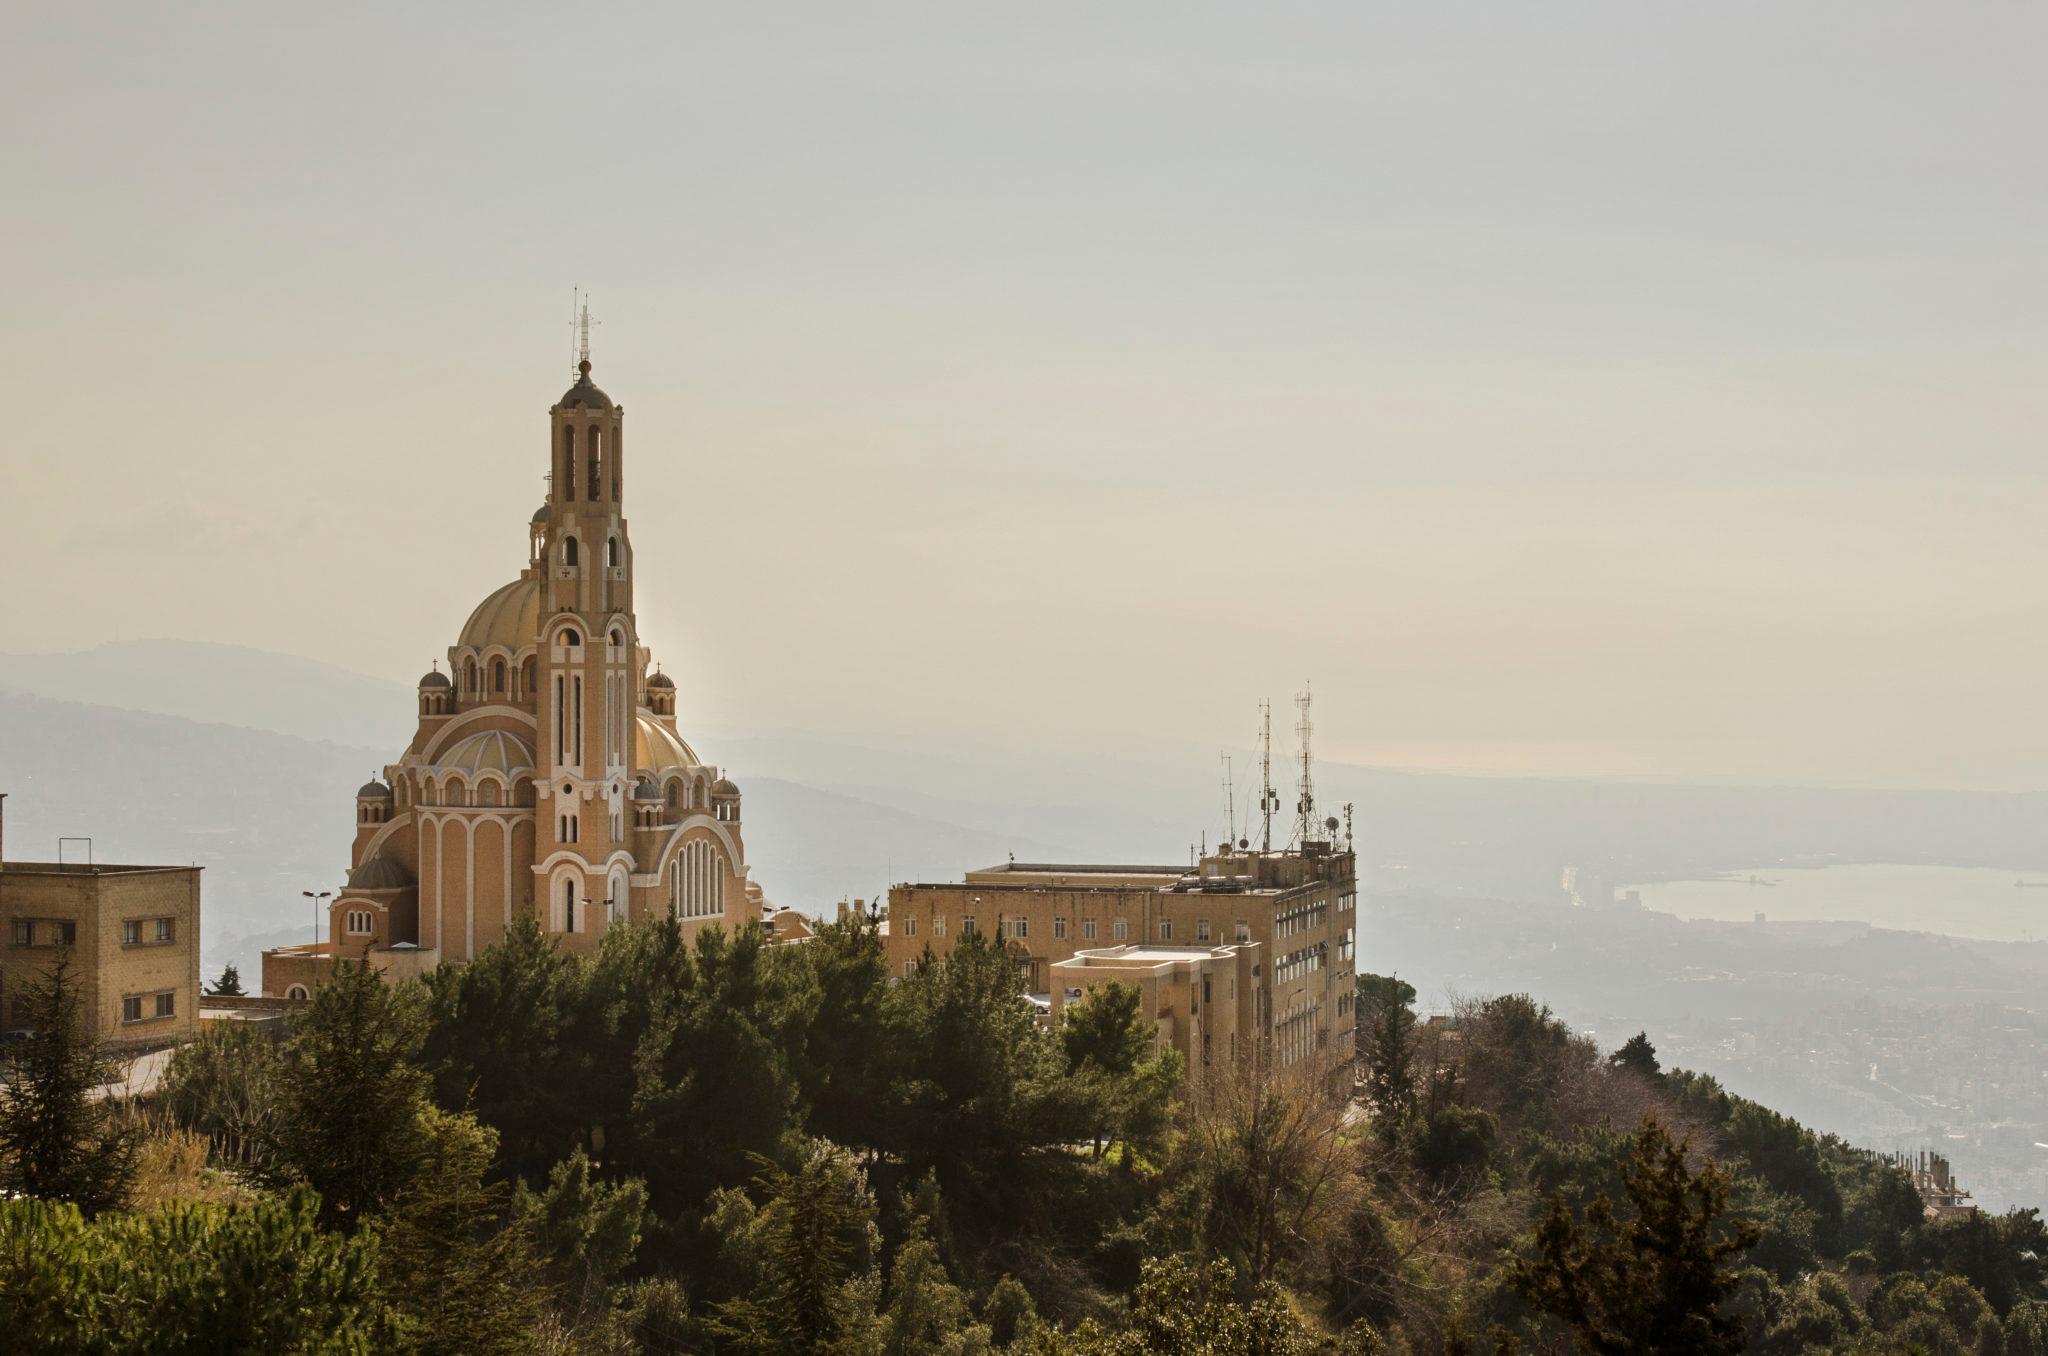 Libanon Urlaub geht gut im April